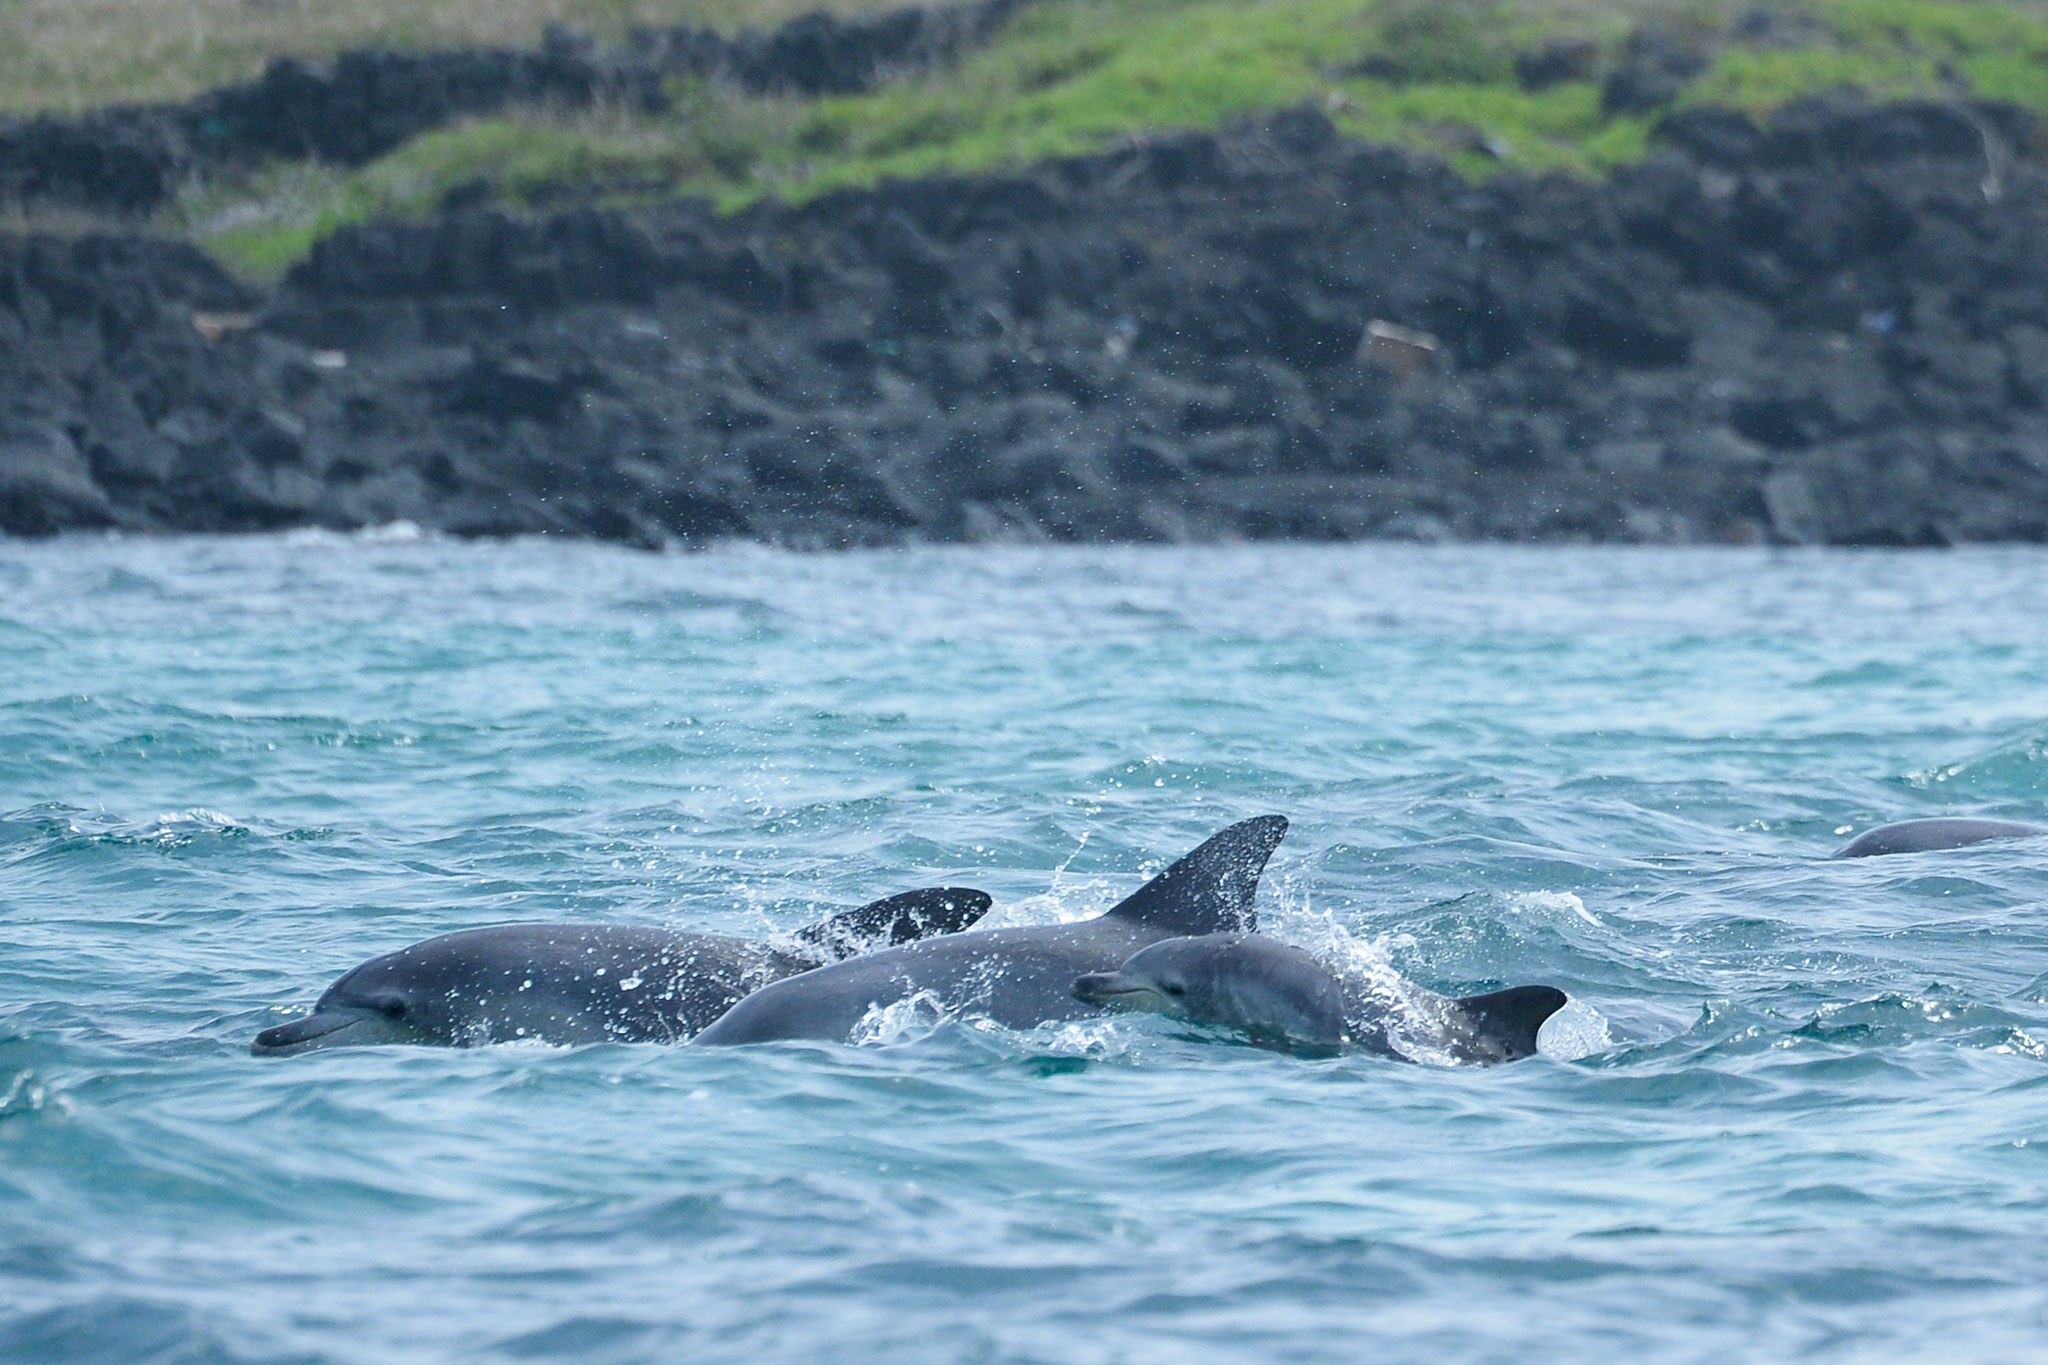 dolphin-captive-wild-calf